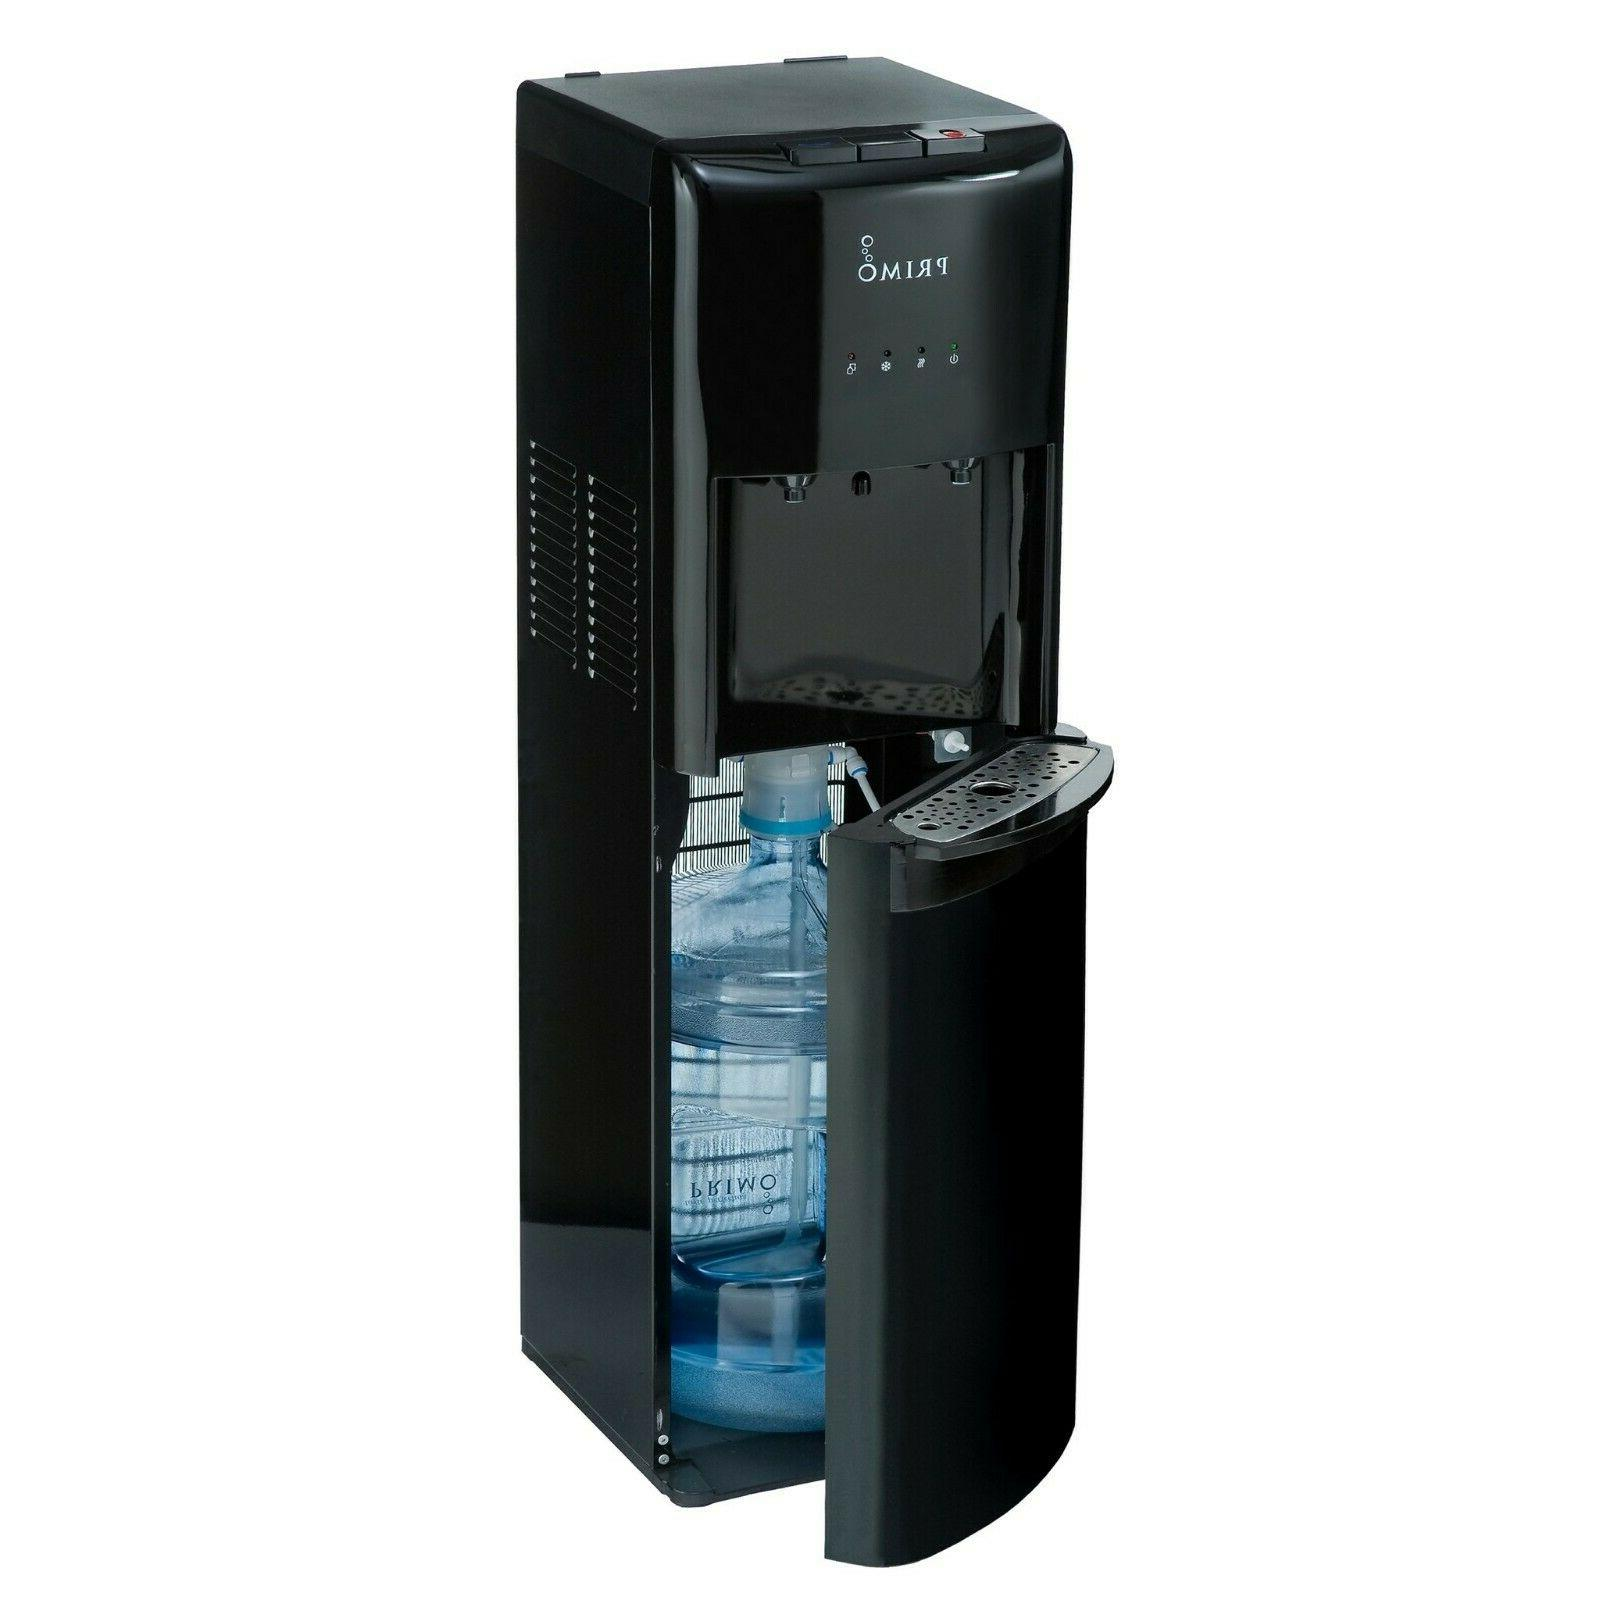 primo 2 spout water dispenser black hot